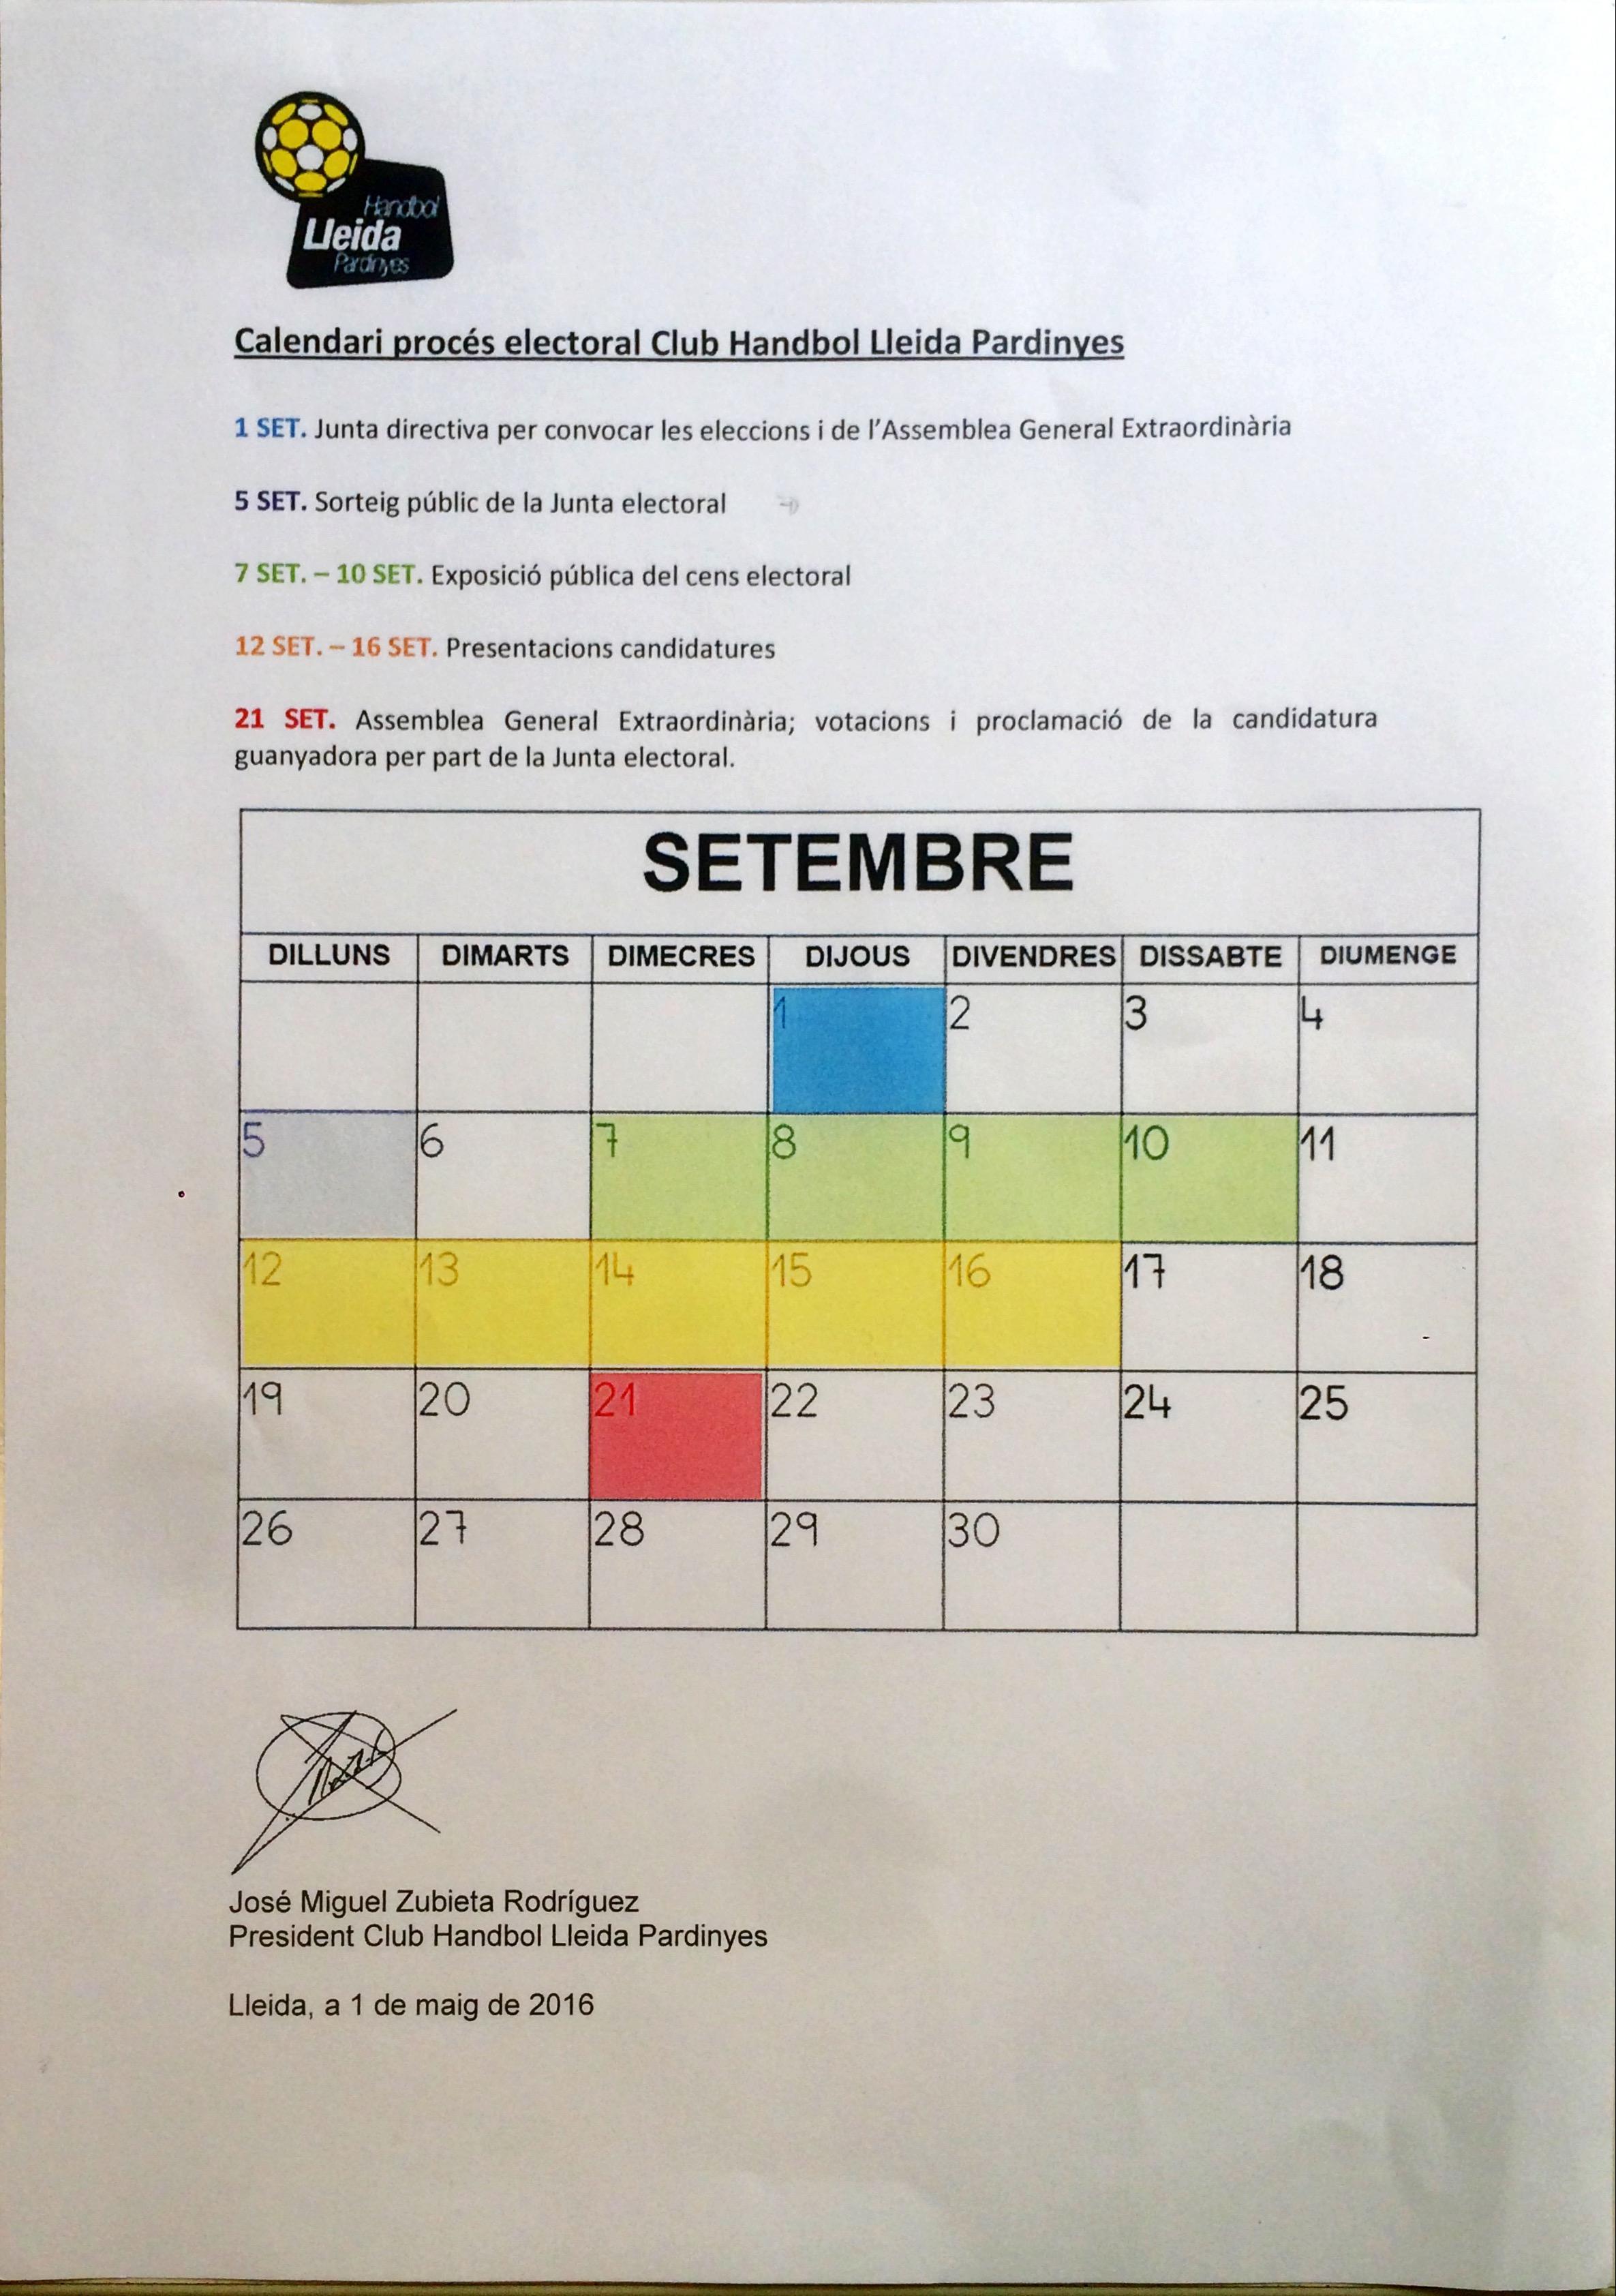 Calendari electoral Handbol Lleida Pardinyes